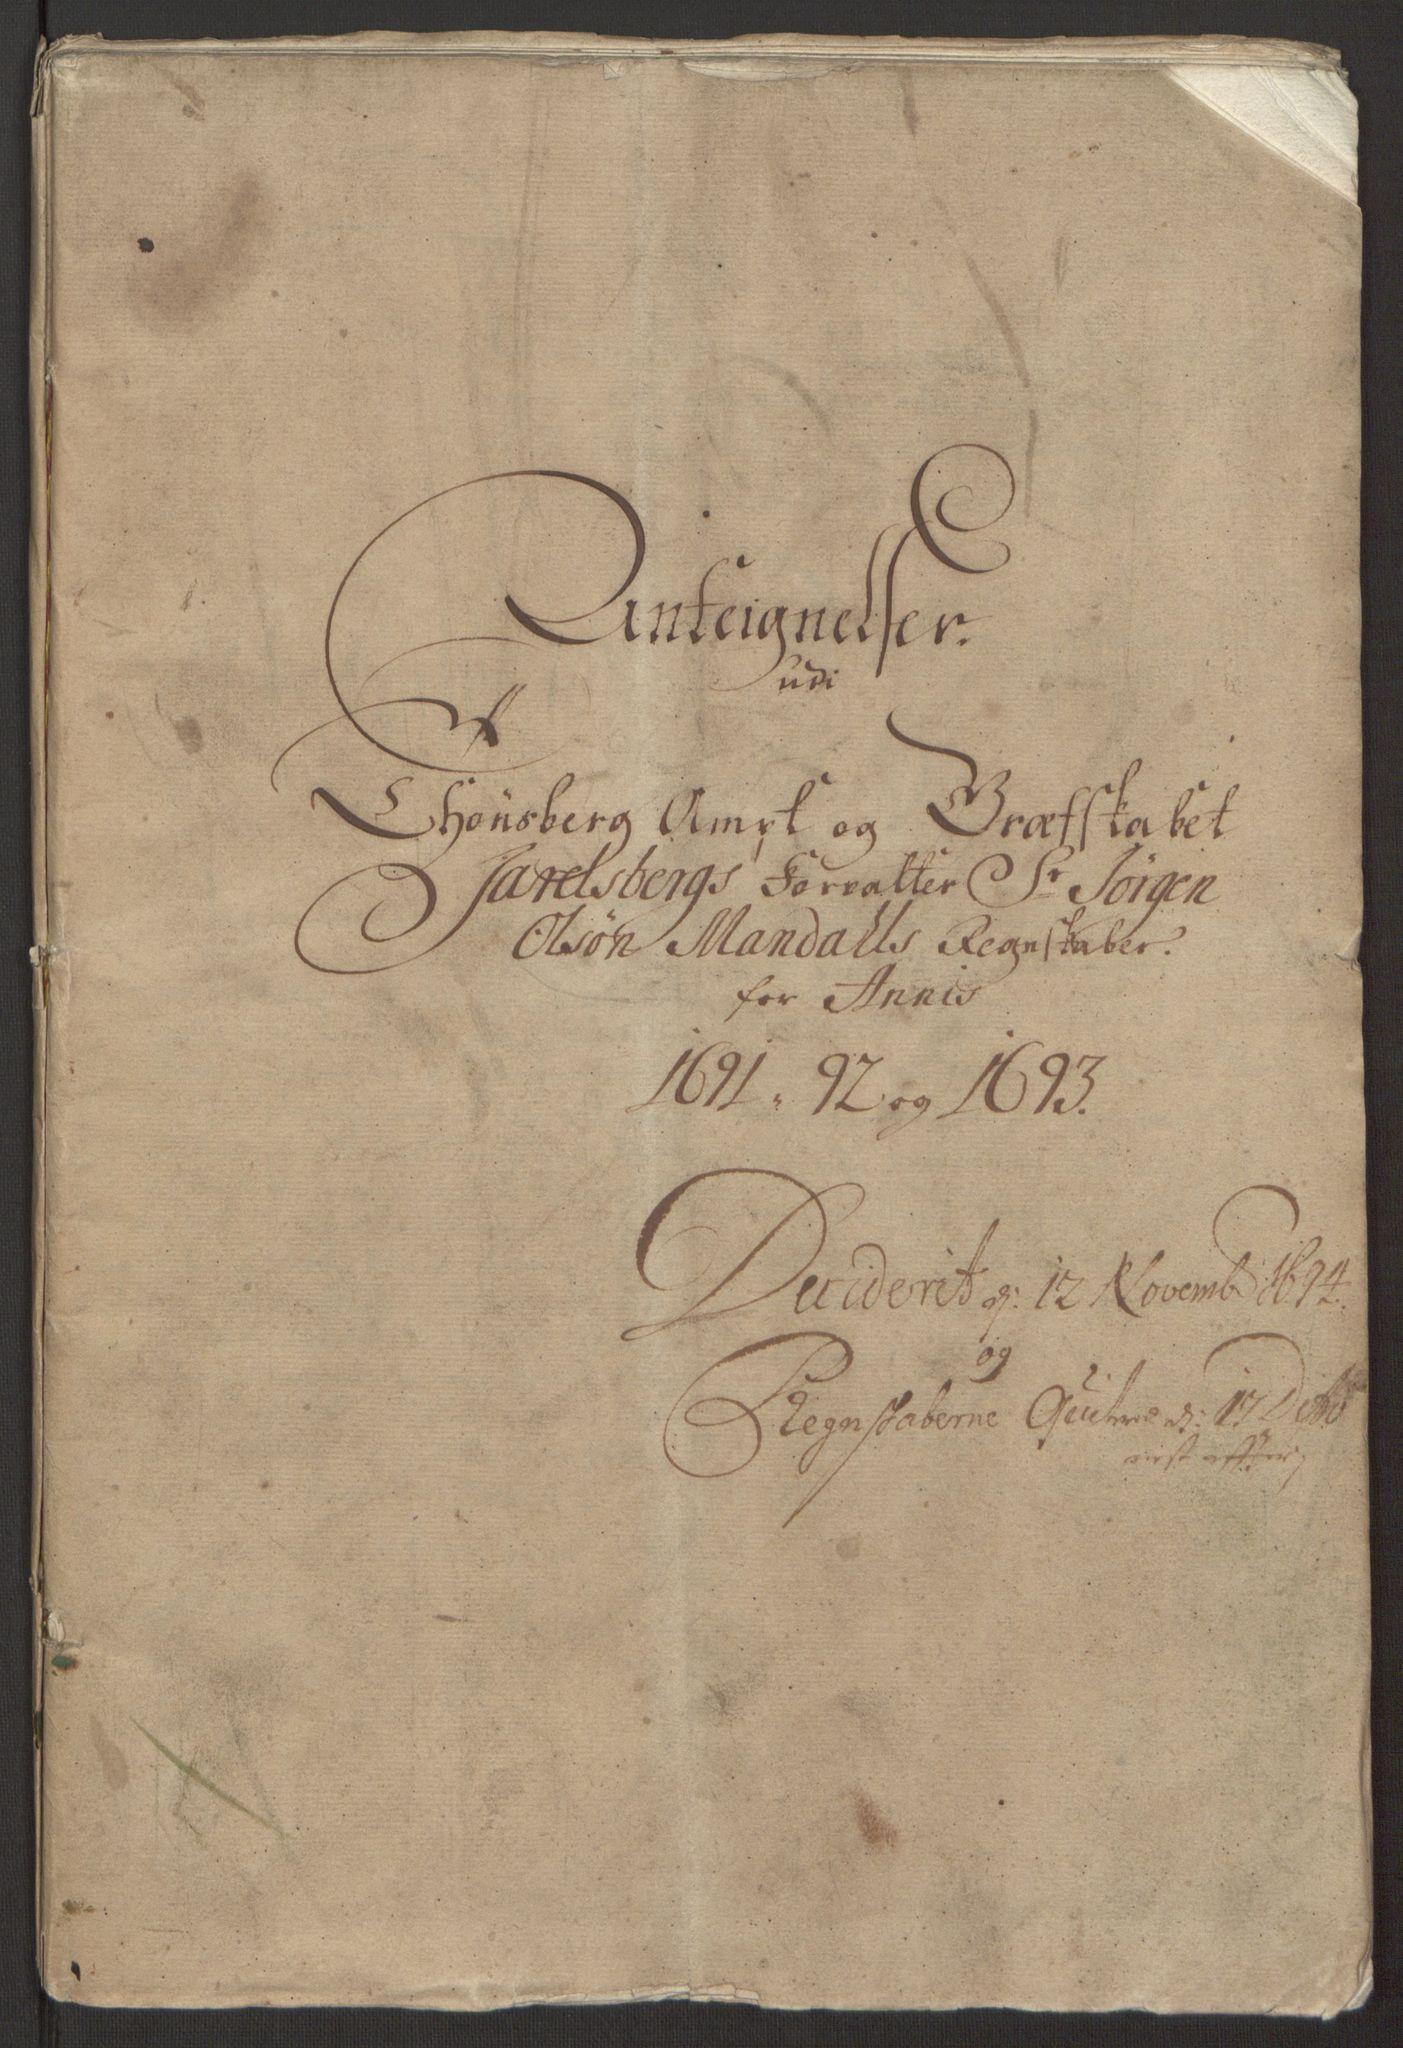 RA, Rentekammeret inntil 1814, Reviderte regnskaper, Fogderegnskap, R32/L1866: Fogderegnskap Jarlsberg grevskap, 1693, s. 426